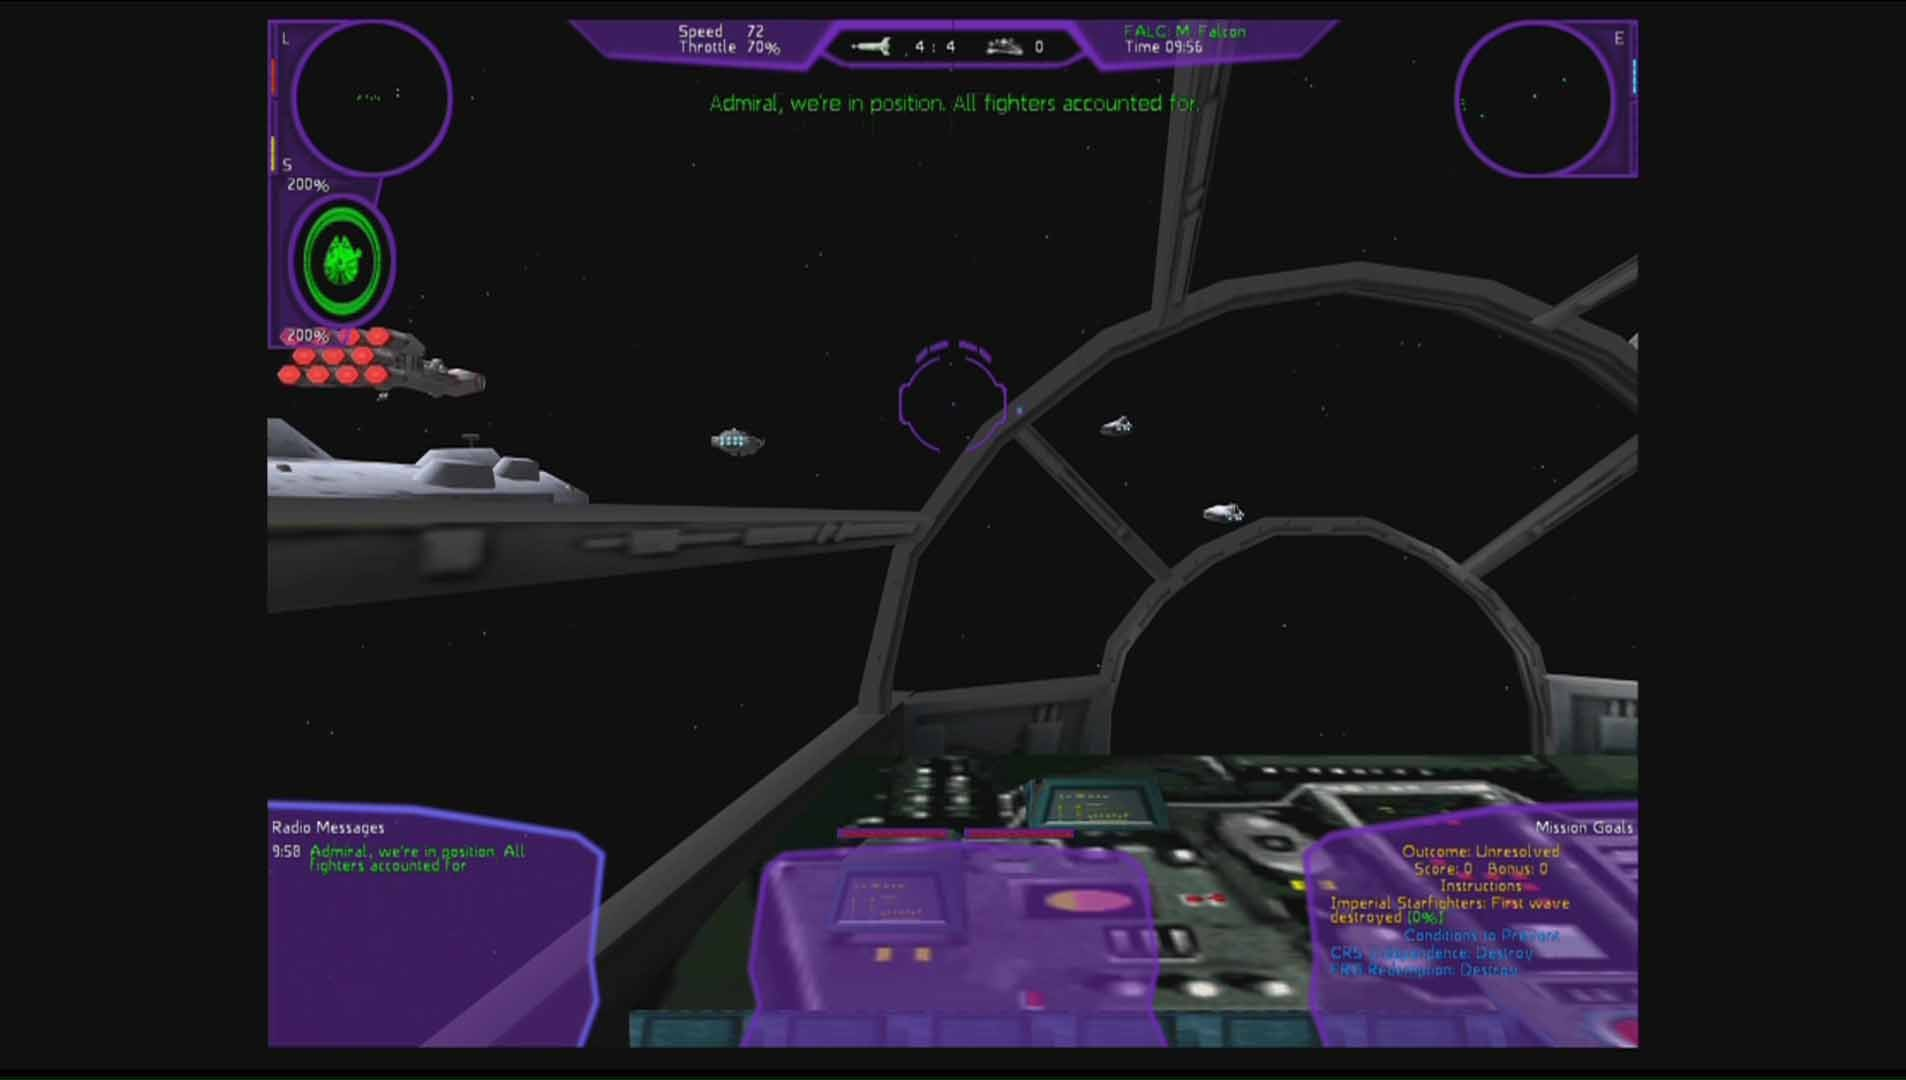 Star Wars X-Wing Alliance: HUD des Millenium Falcon